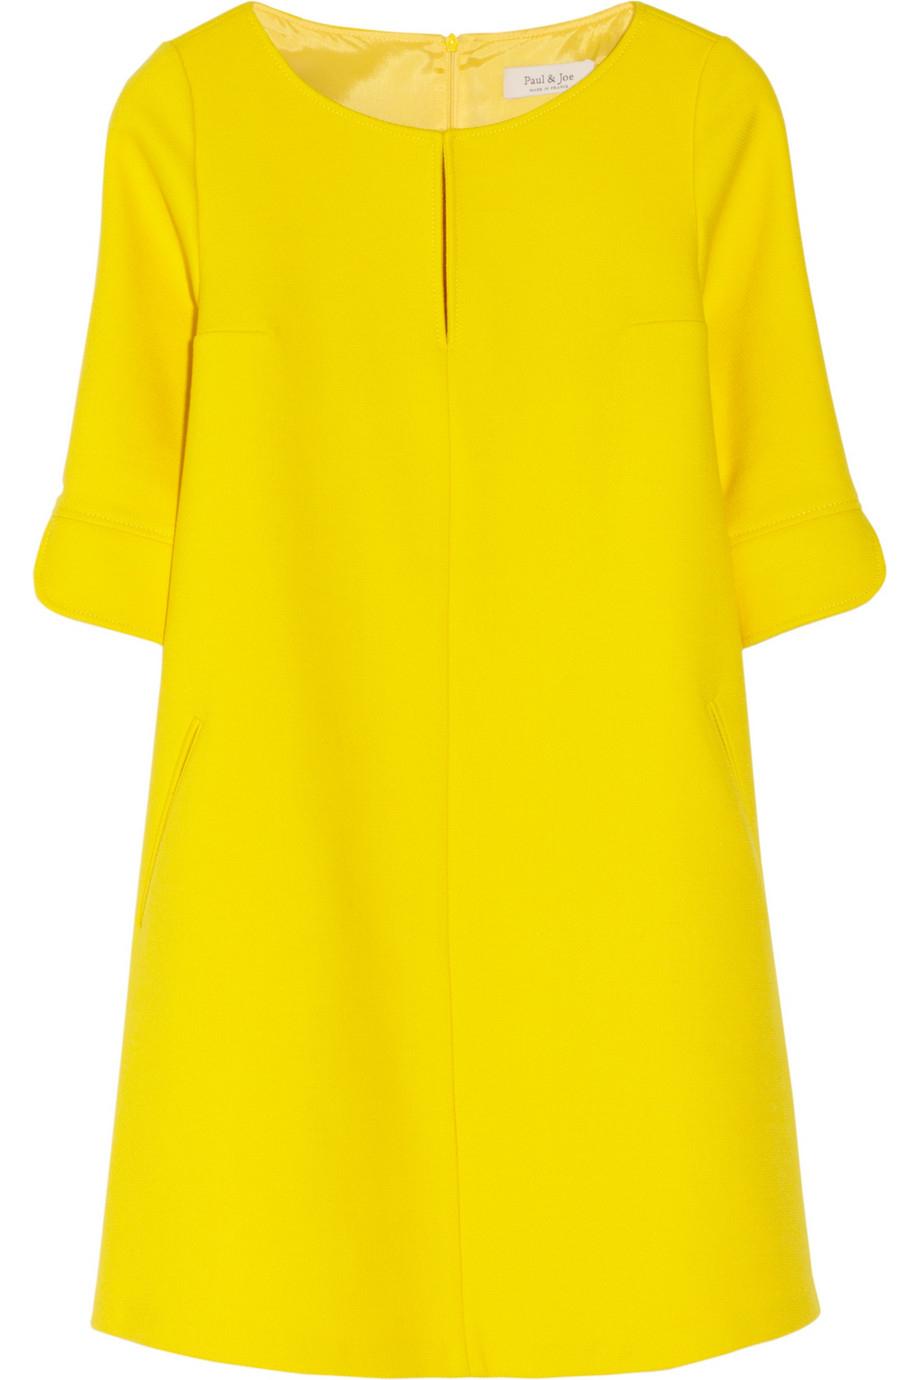 paul joe rikita woolblend twill tunic dress in yellow lyst. Black Bedroom Furniture Sets. Home Design Ideas